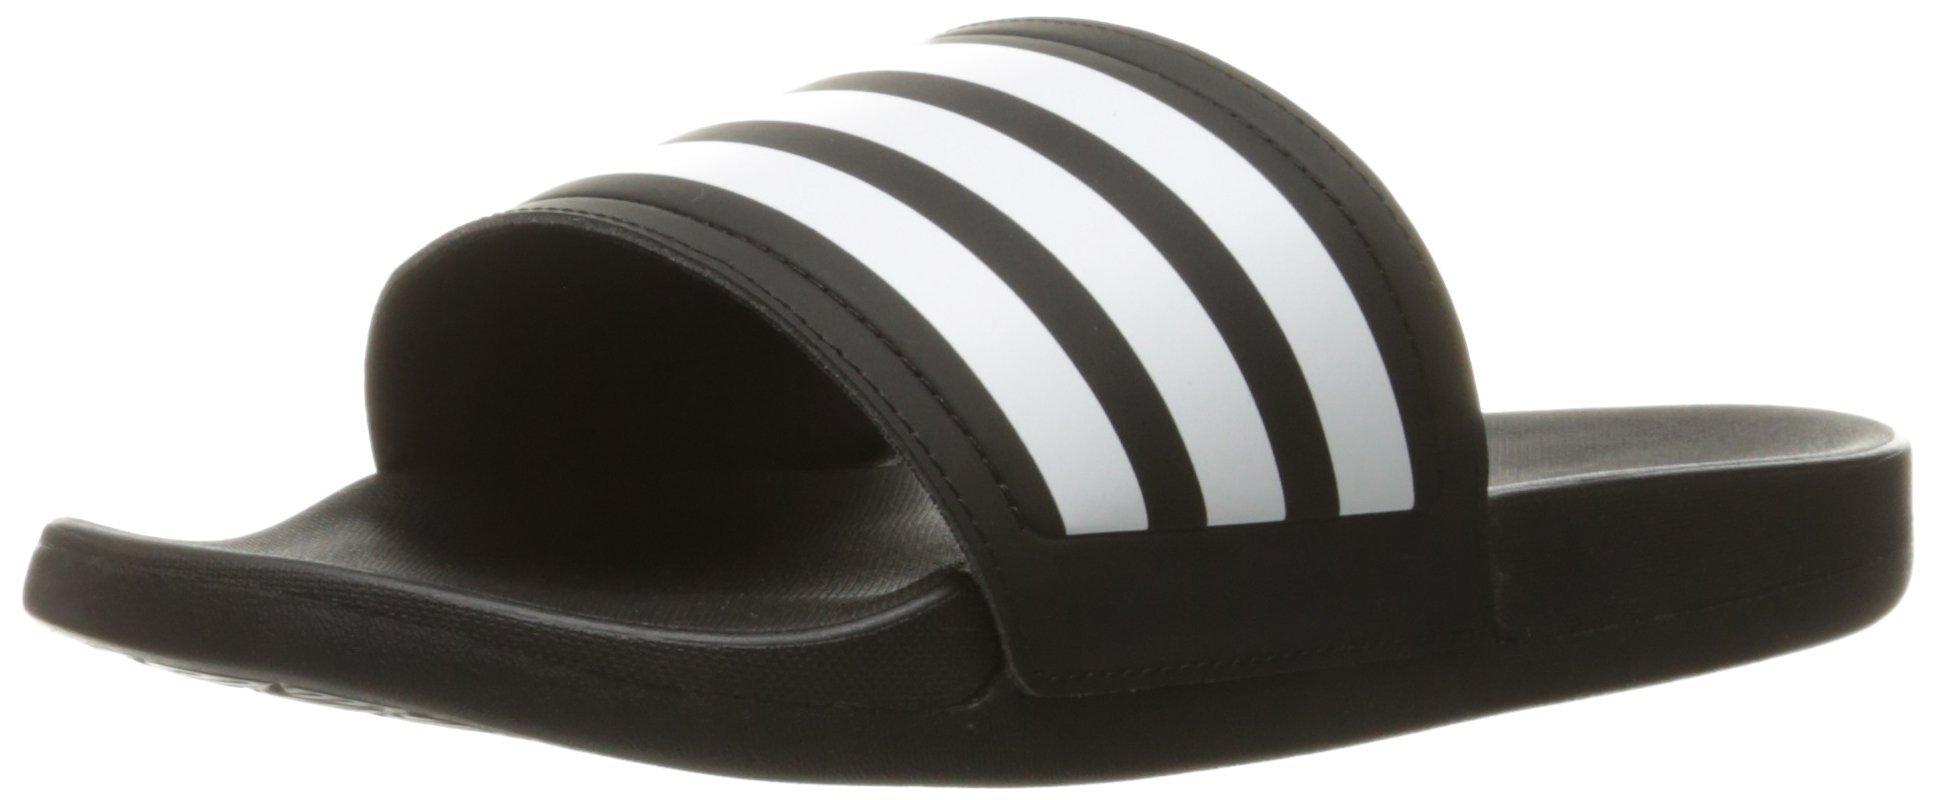 adidas Womens' Shoes   Adilette CF Ultra Stripes Athletic Slide Sandals, Black/White/Black, (8 M US)